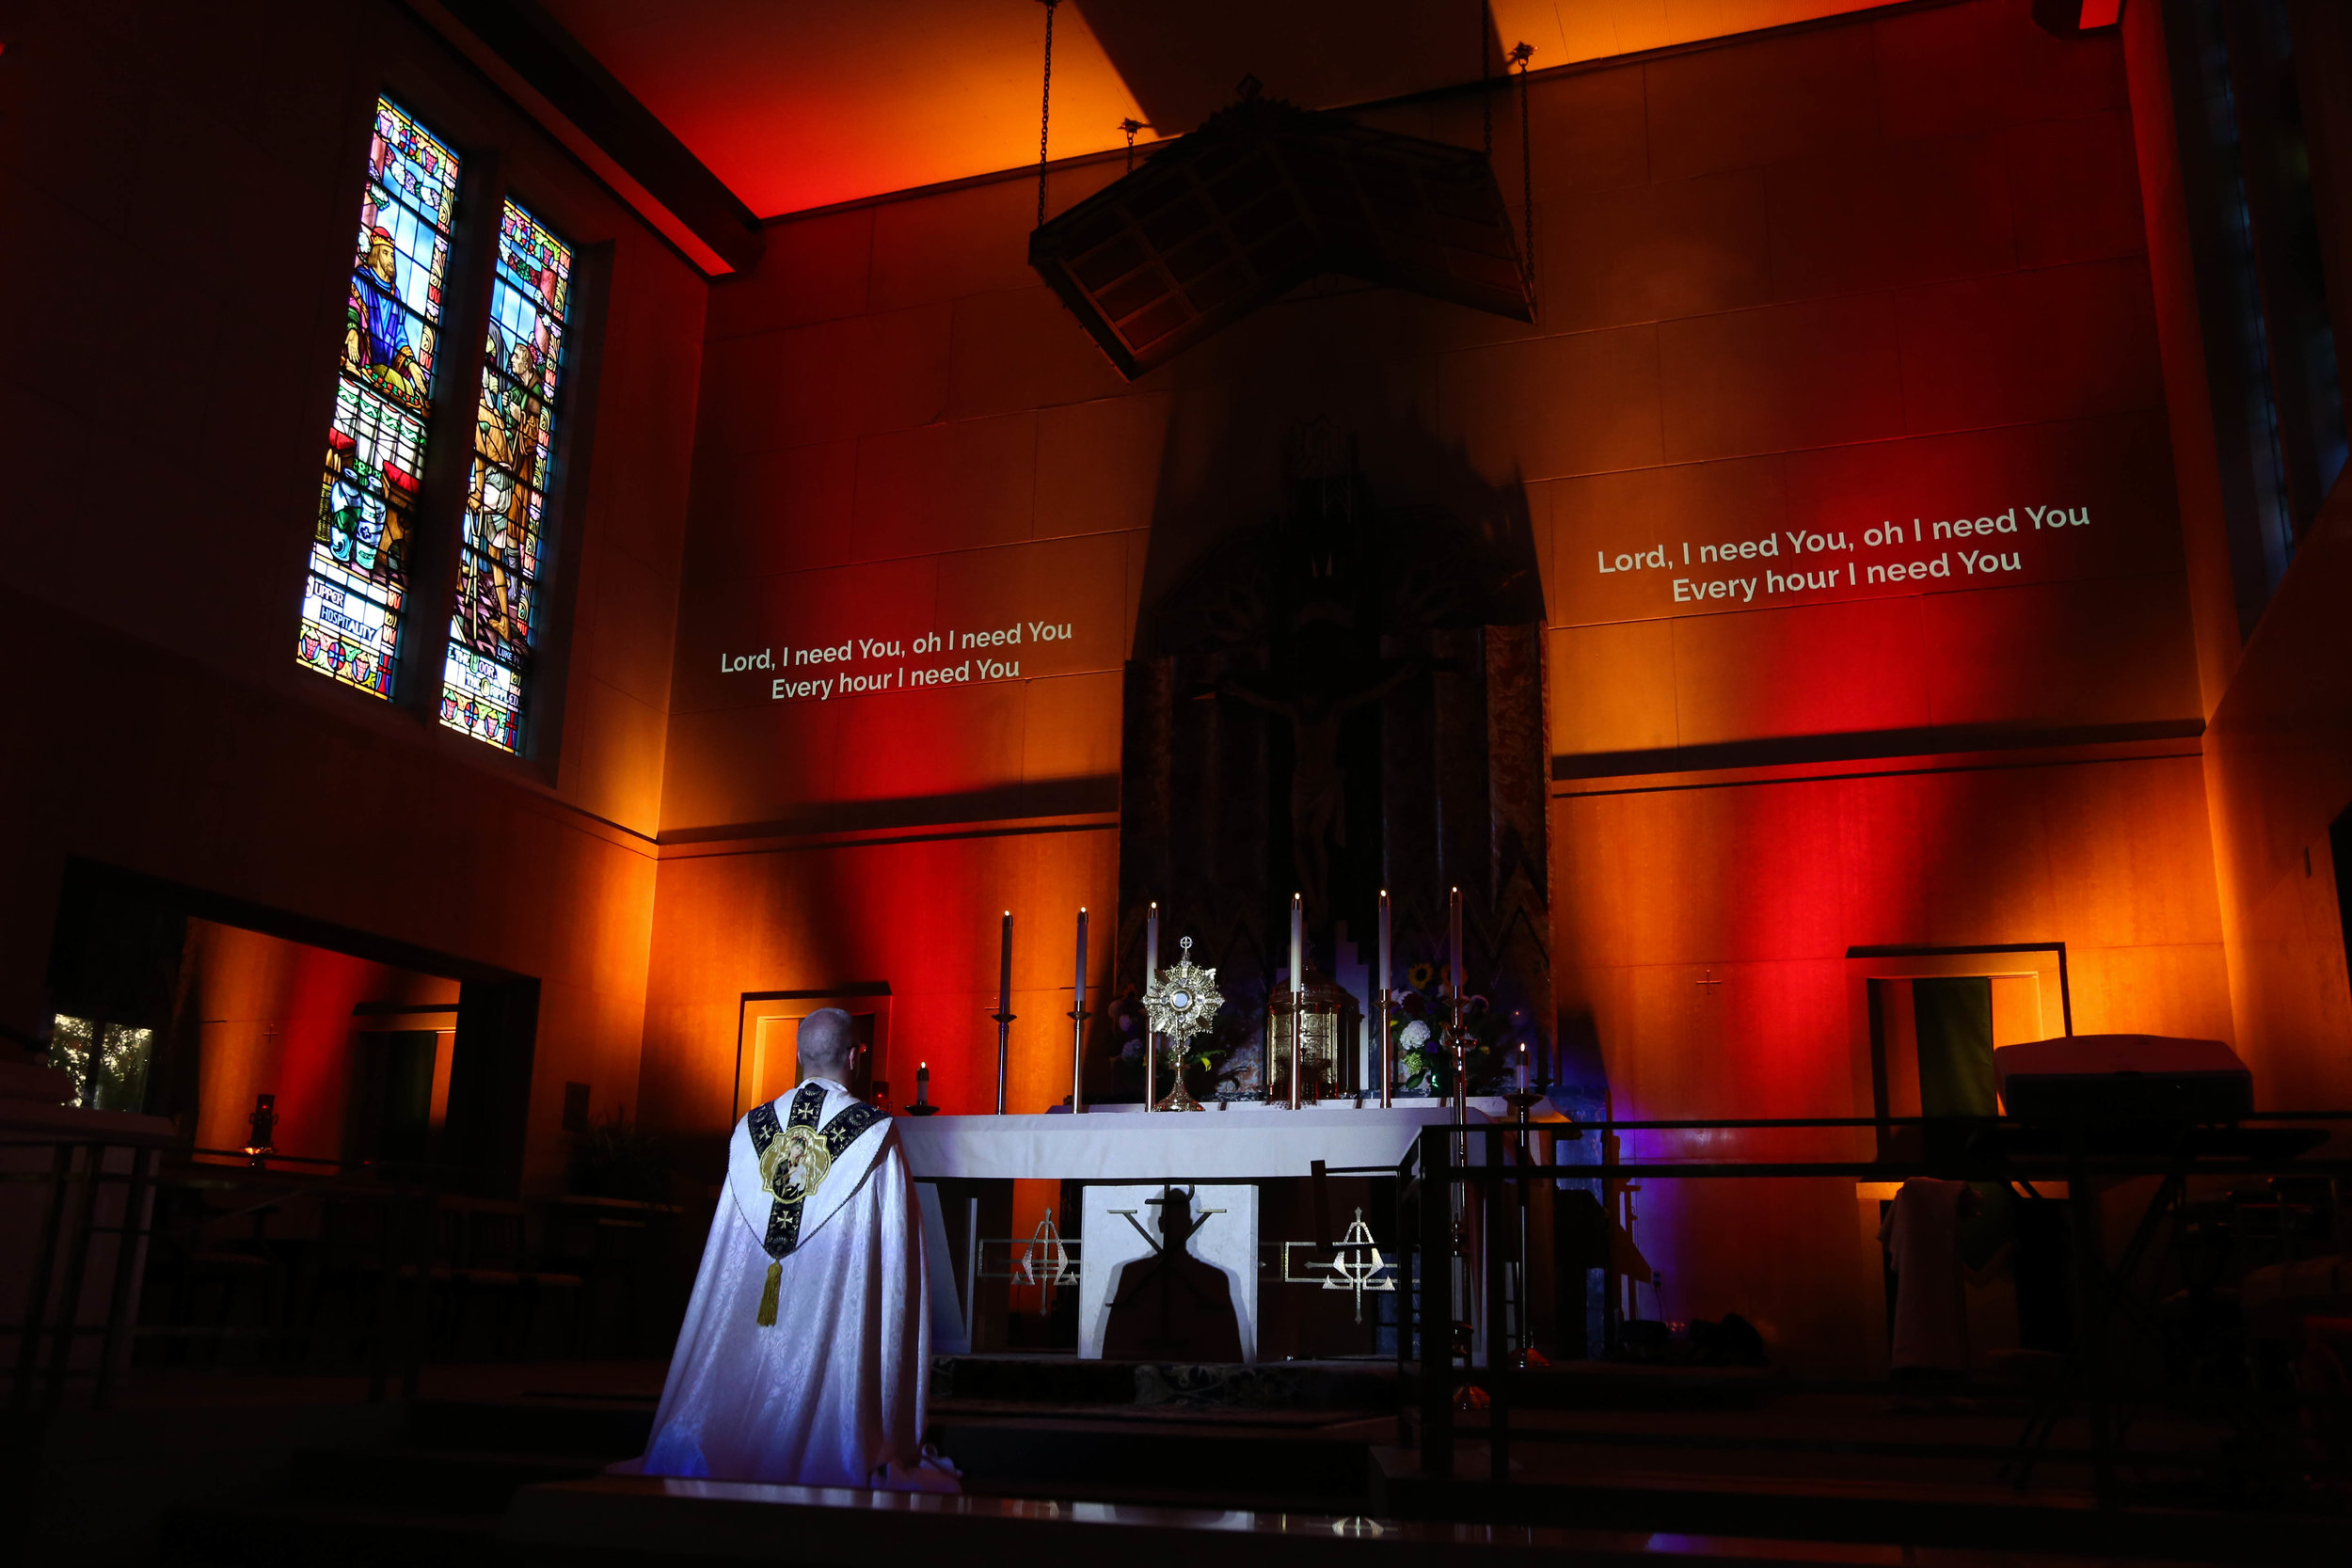 Blessed Sacrament, Wichita - Adoration